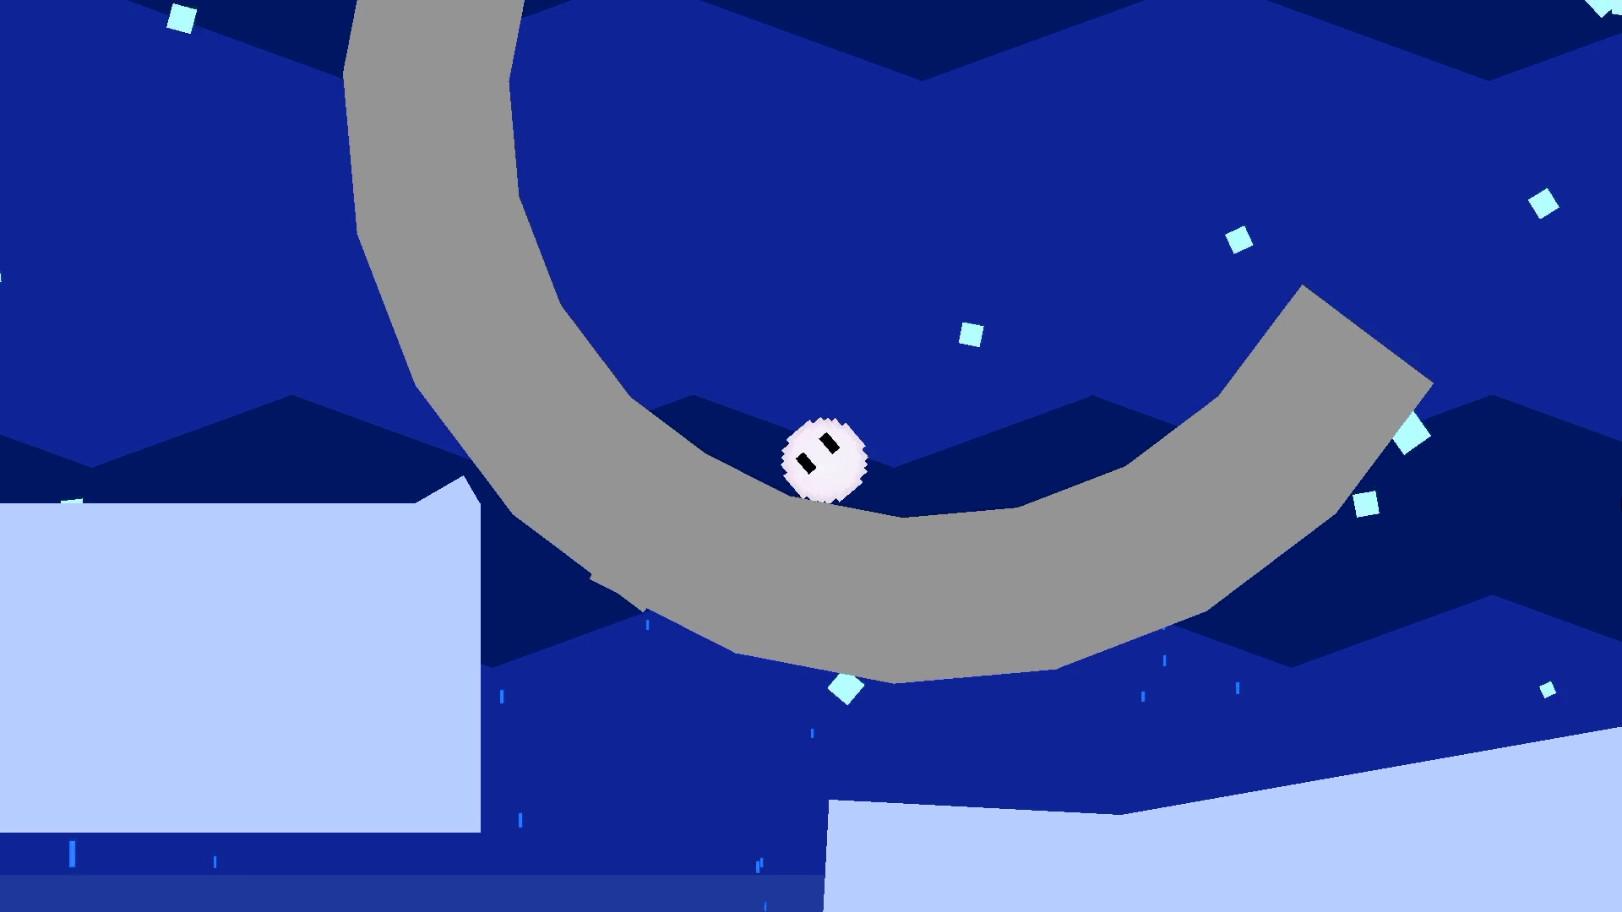 Ascent screenshot